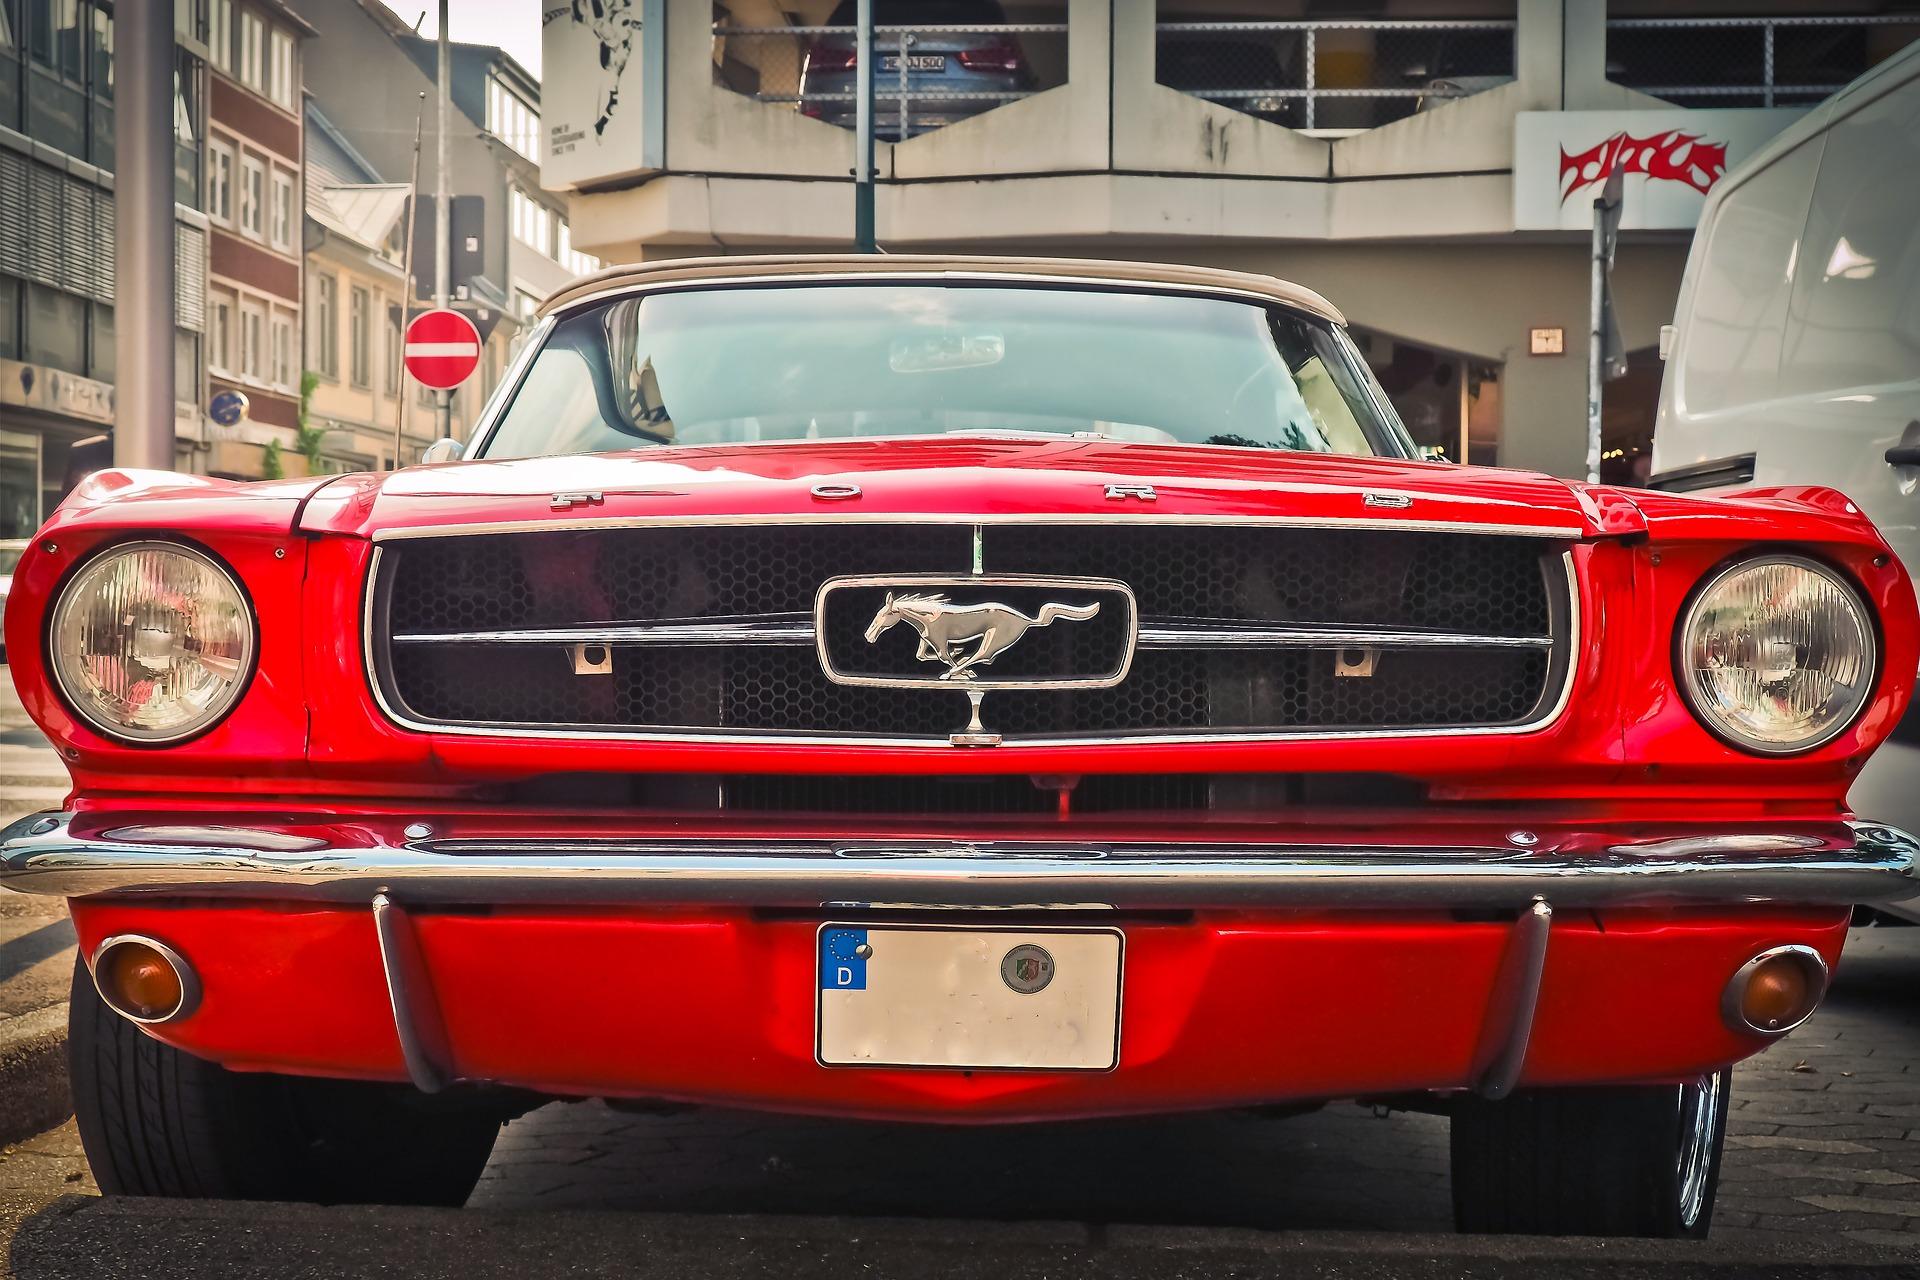 Vintage Muscle Car Tumblr